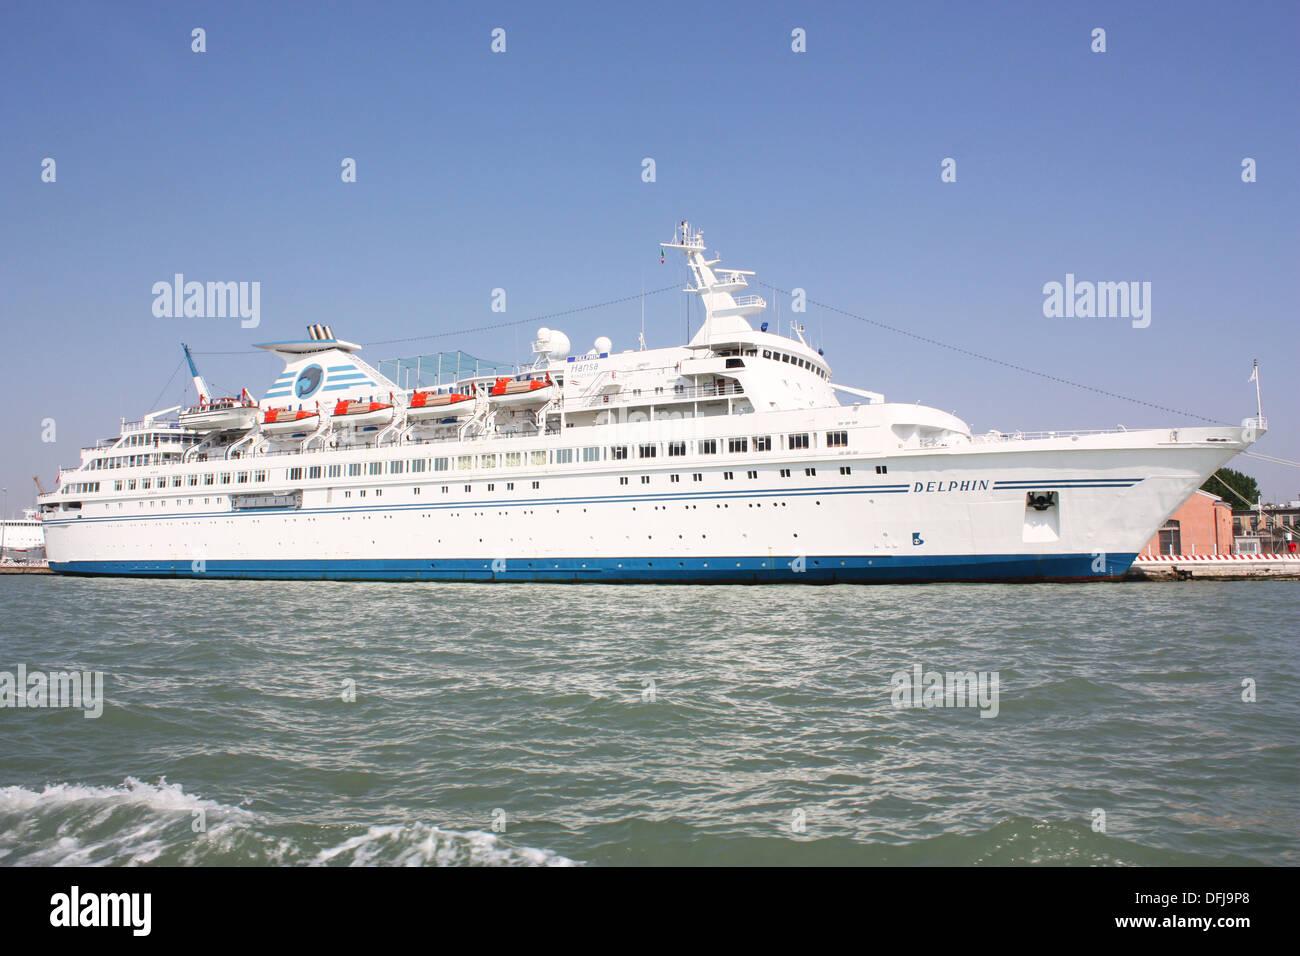 Delphine white ship in Venice, Italy - Stock Image